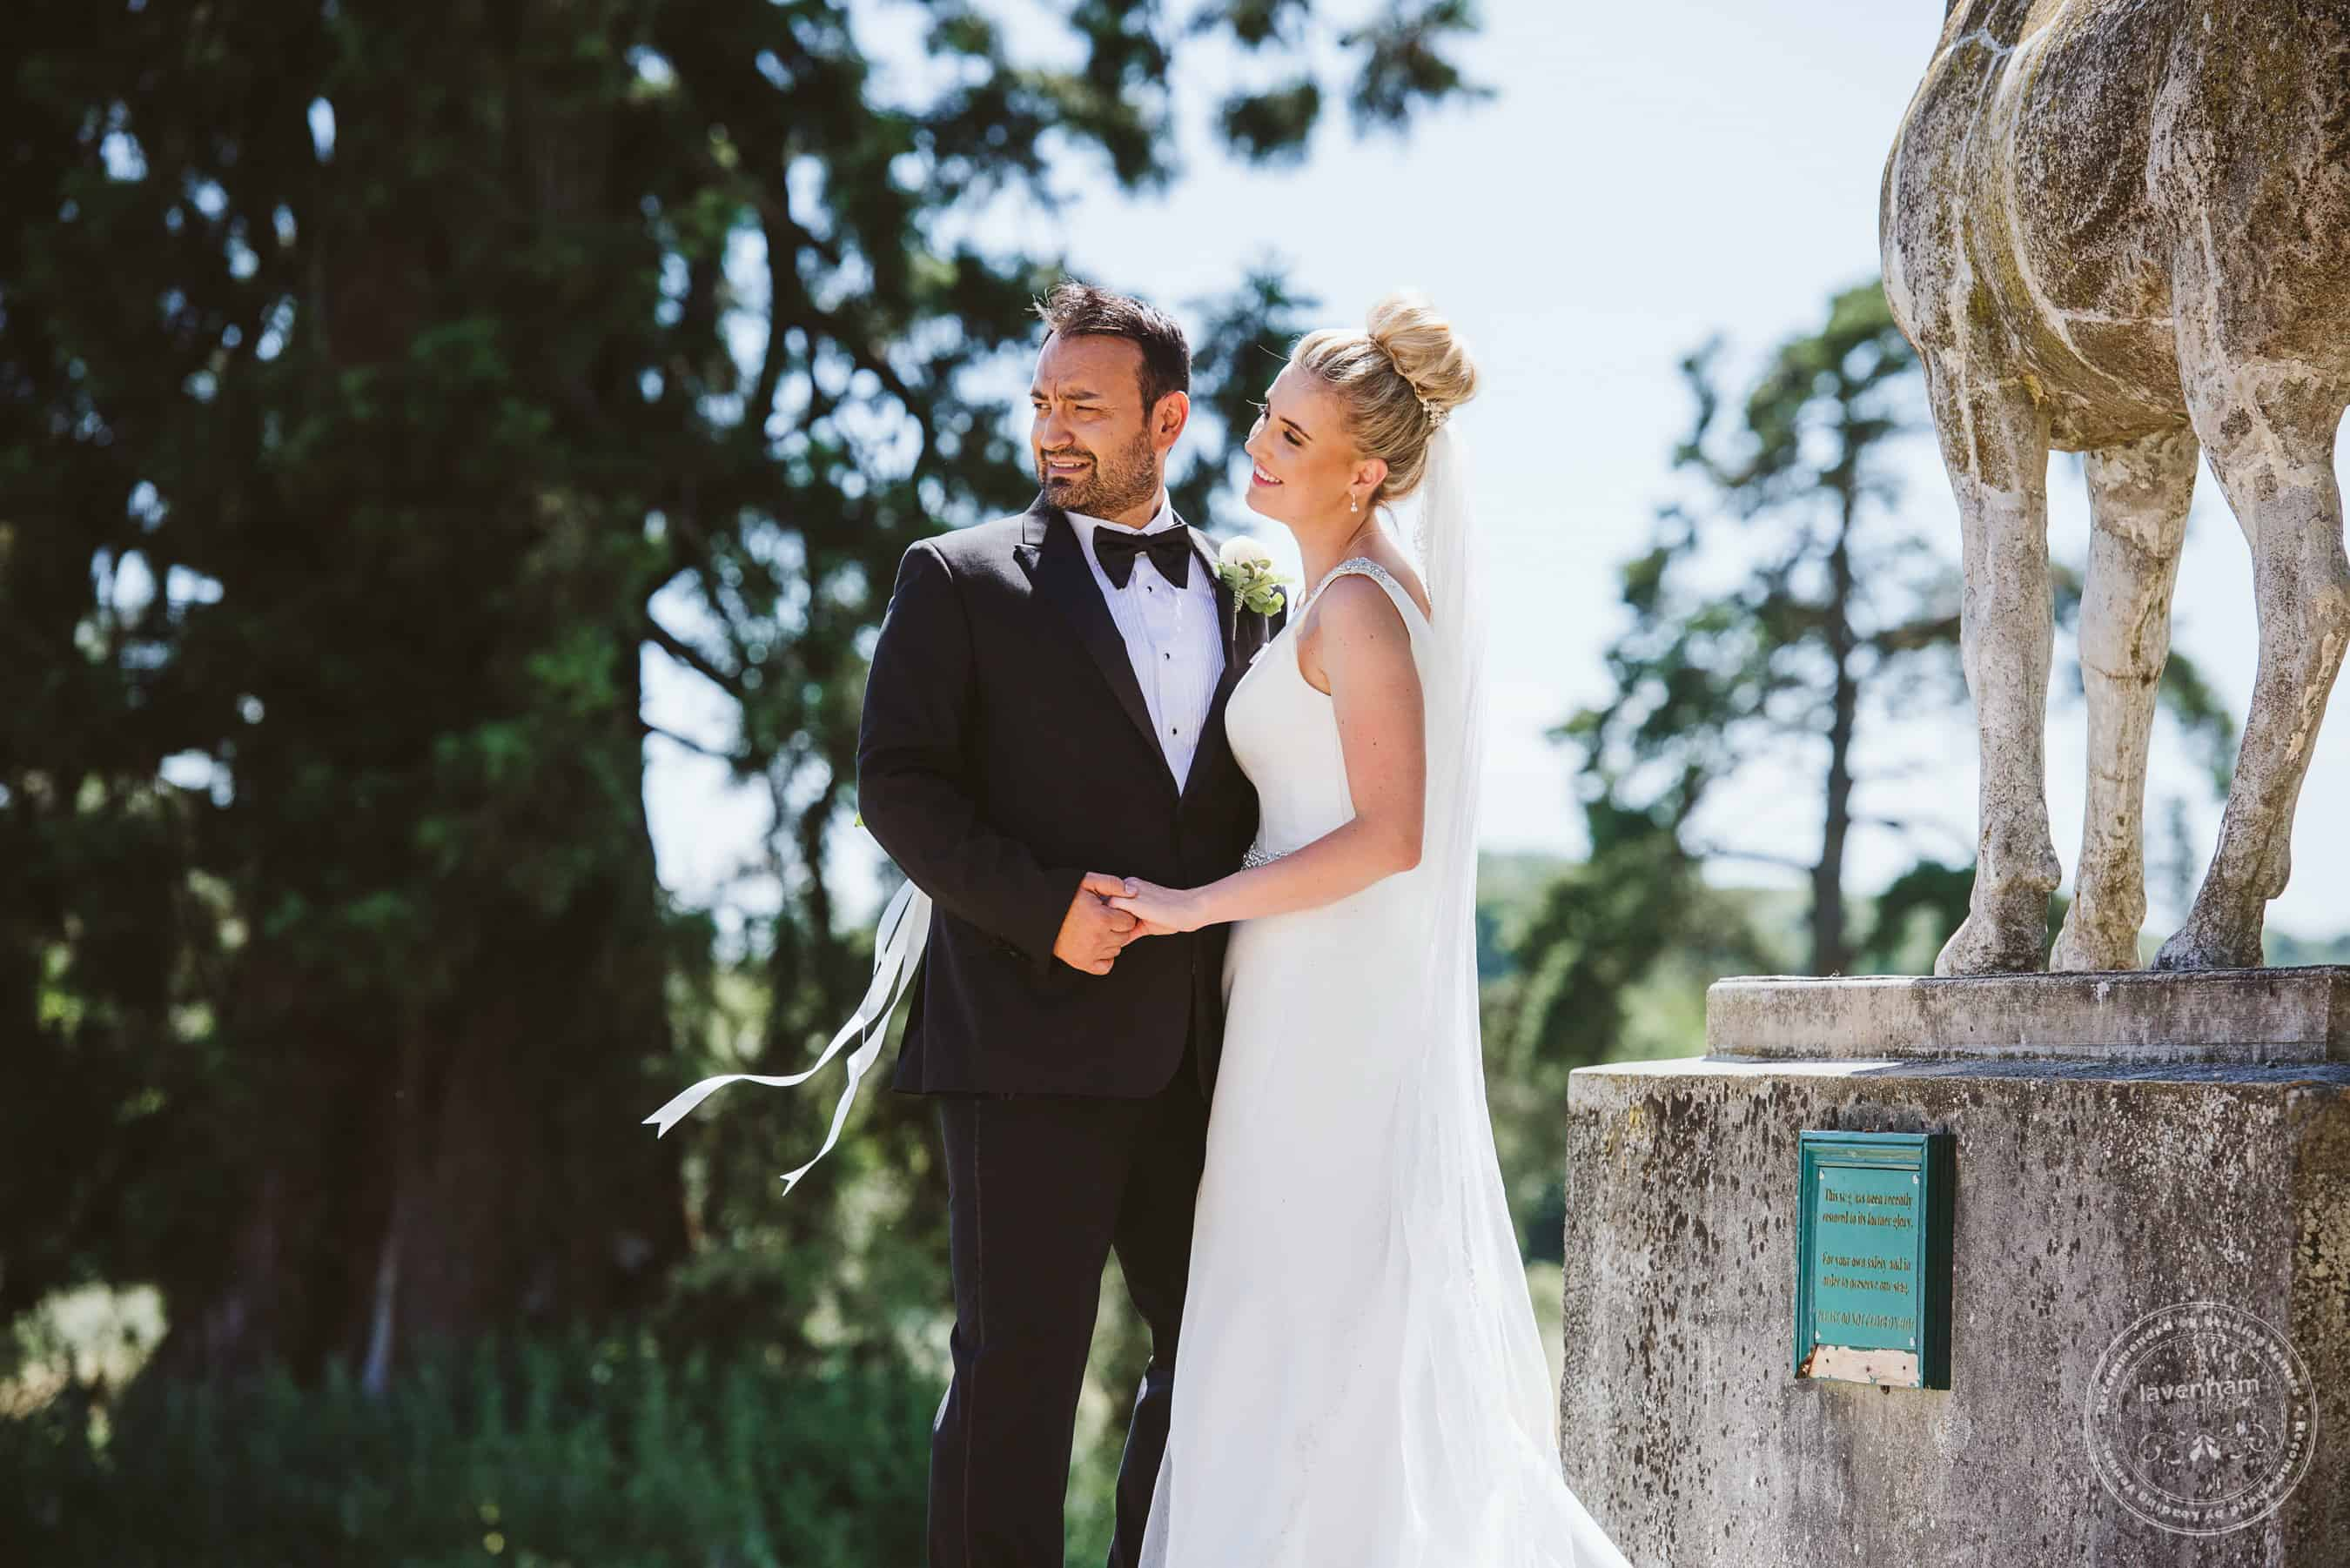 220618 Gosfield Hall Wedding Photography Lavenham Photographic 0129